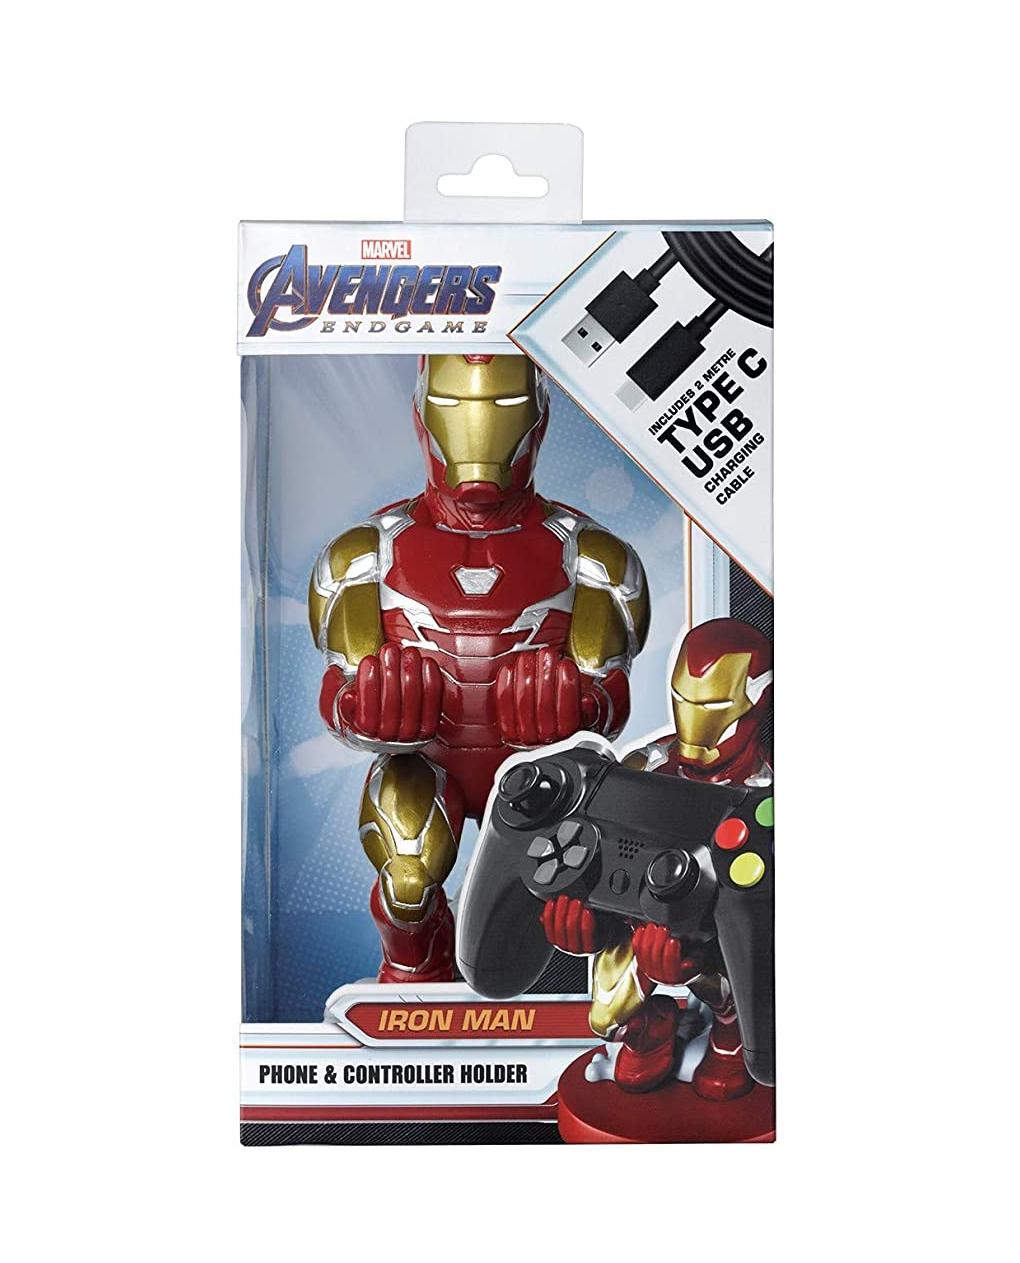 Soporte Iron Man para mando de consola o smartphone